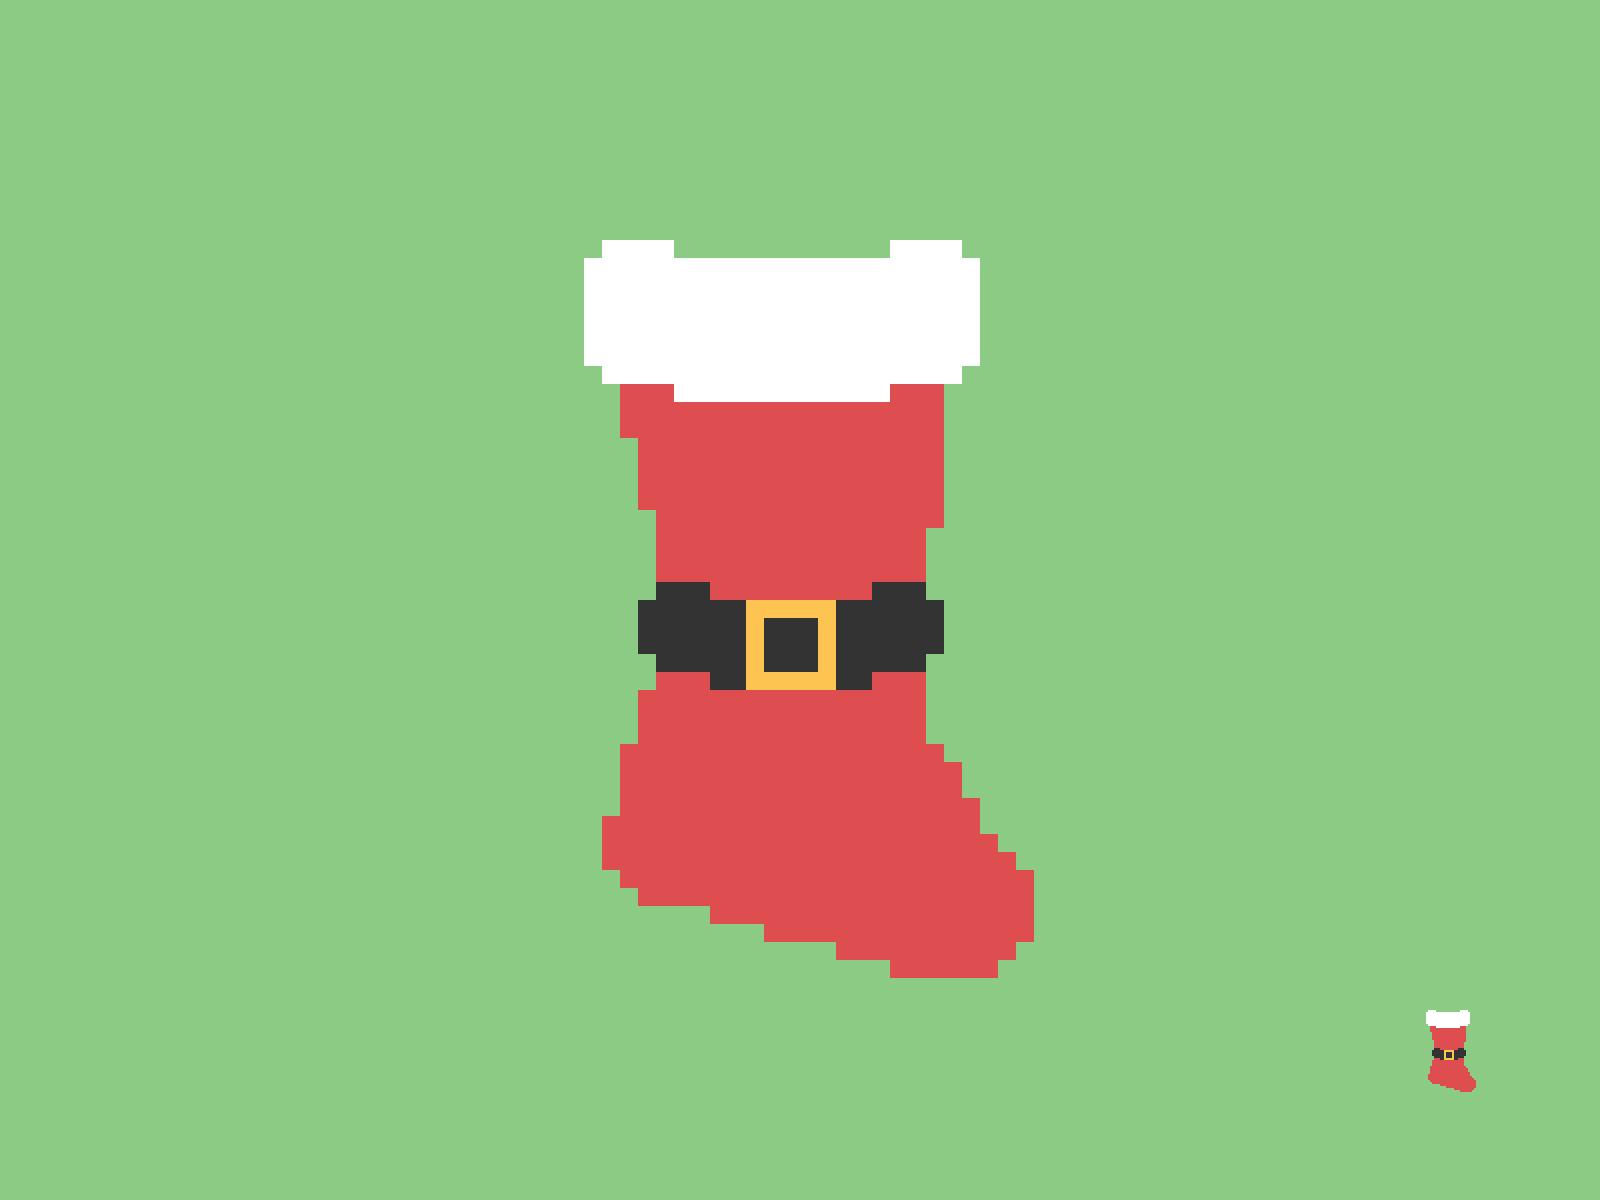 Christmas Stocking Pixel